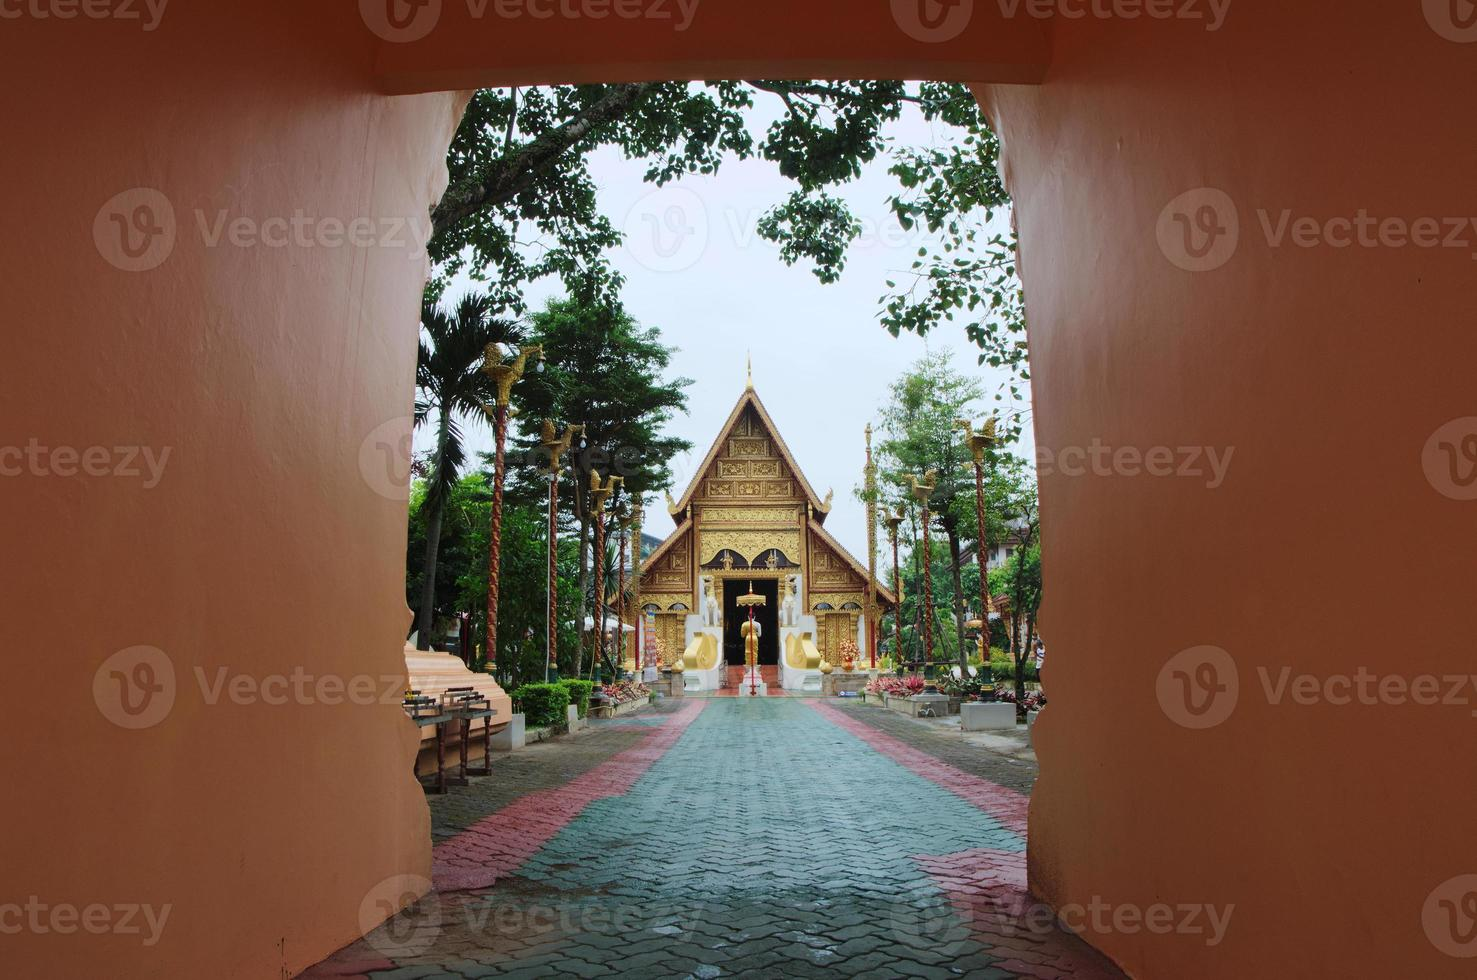 Wat Phra Sing Temple à Chiang Rai, regardez à travers la porte photo